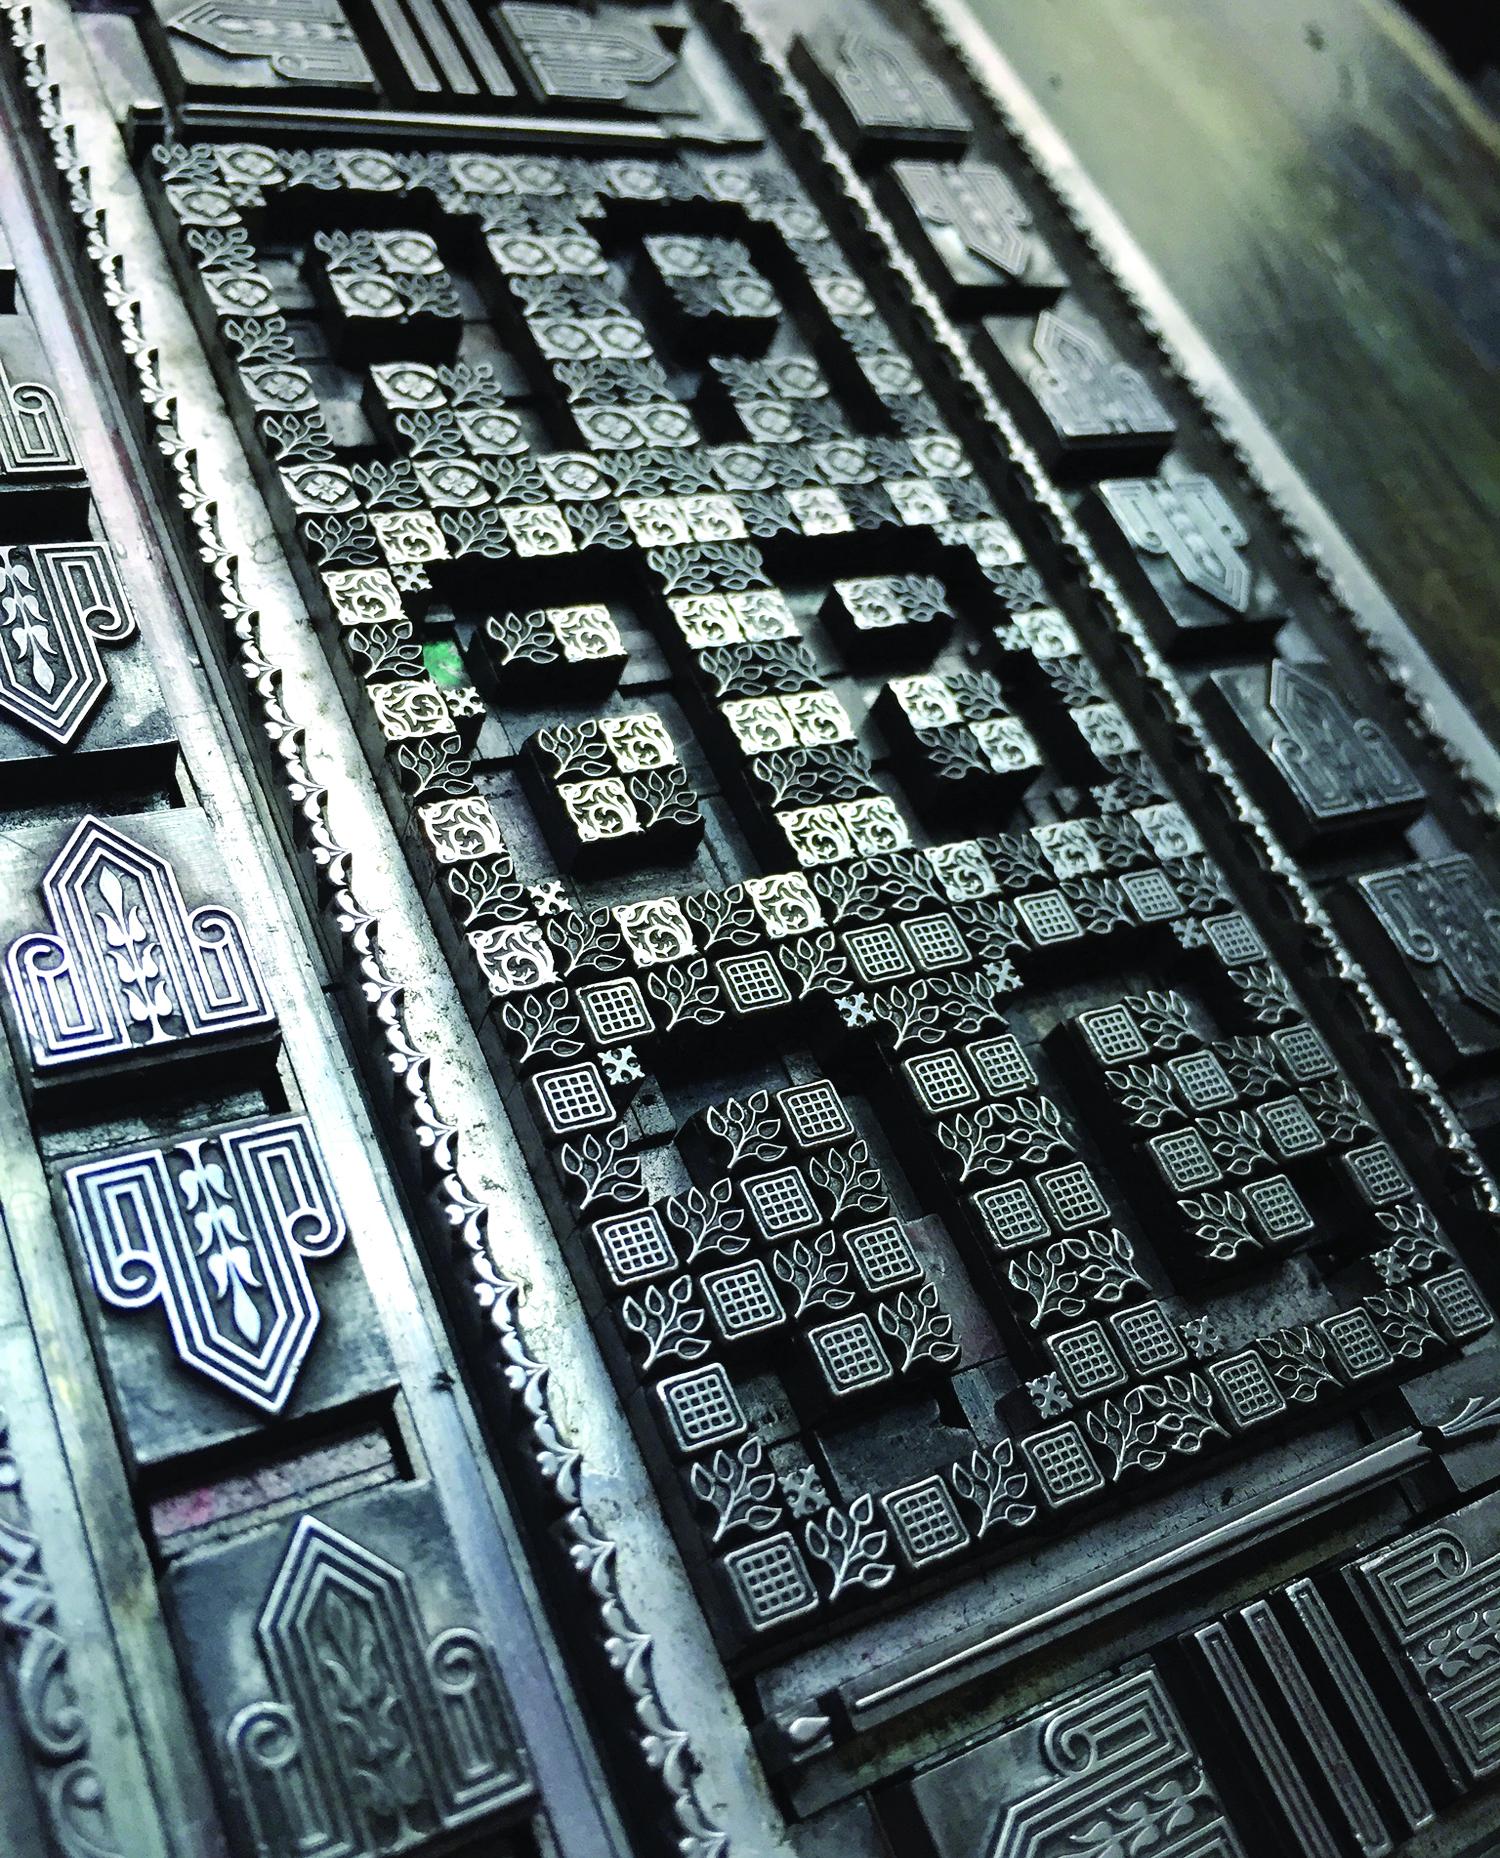 endpapertype